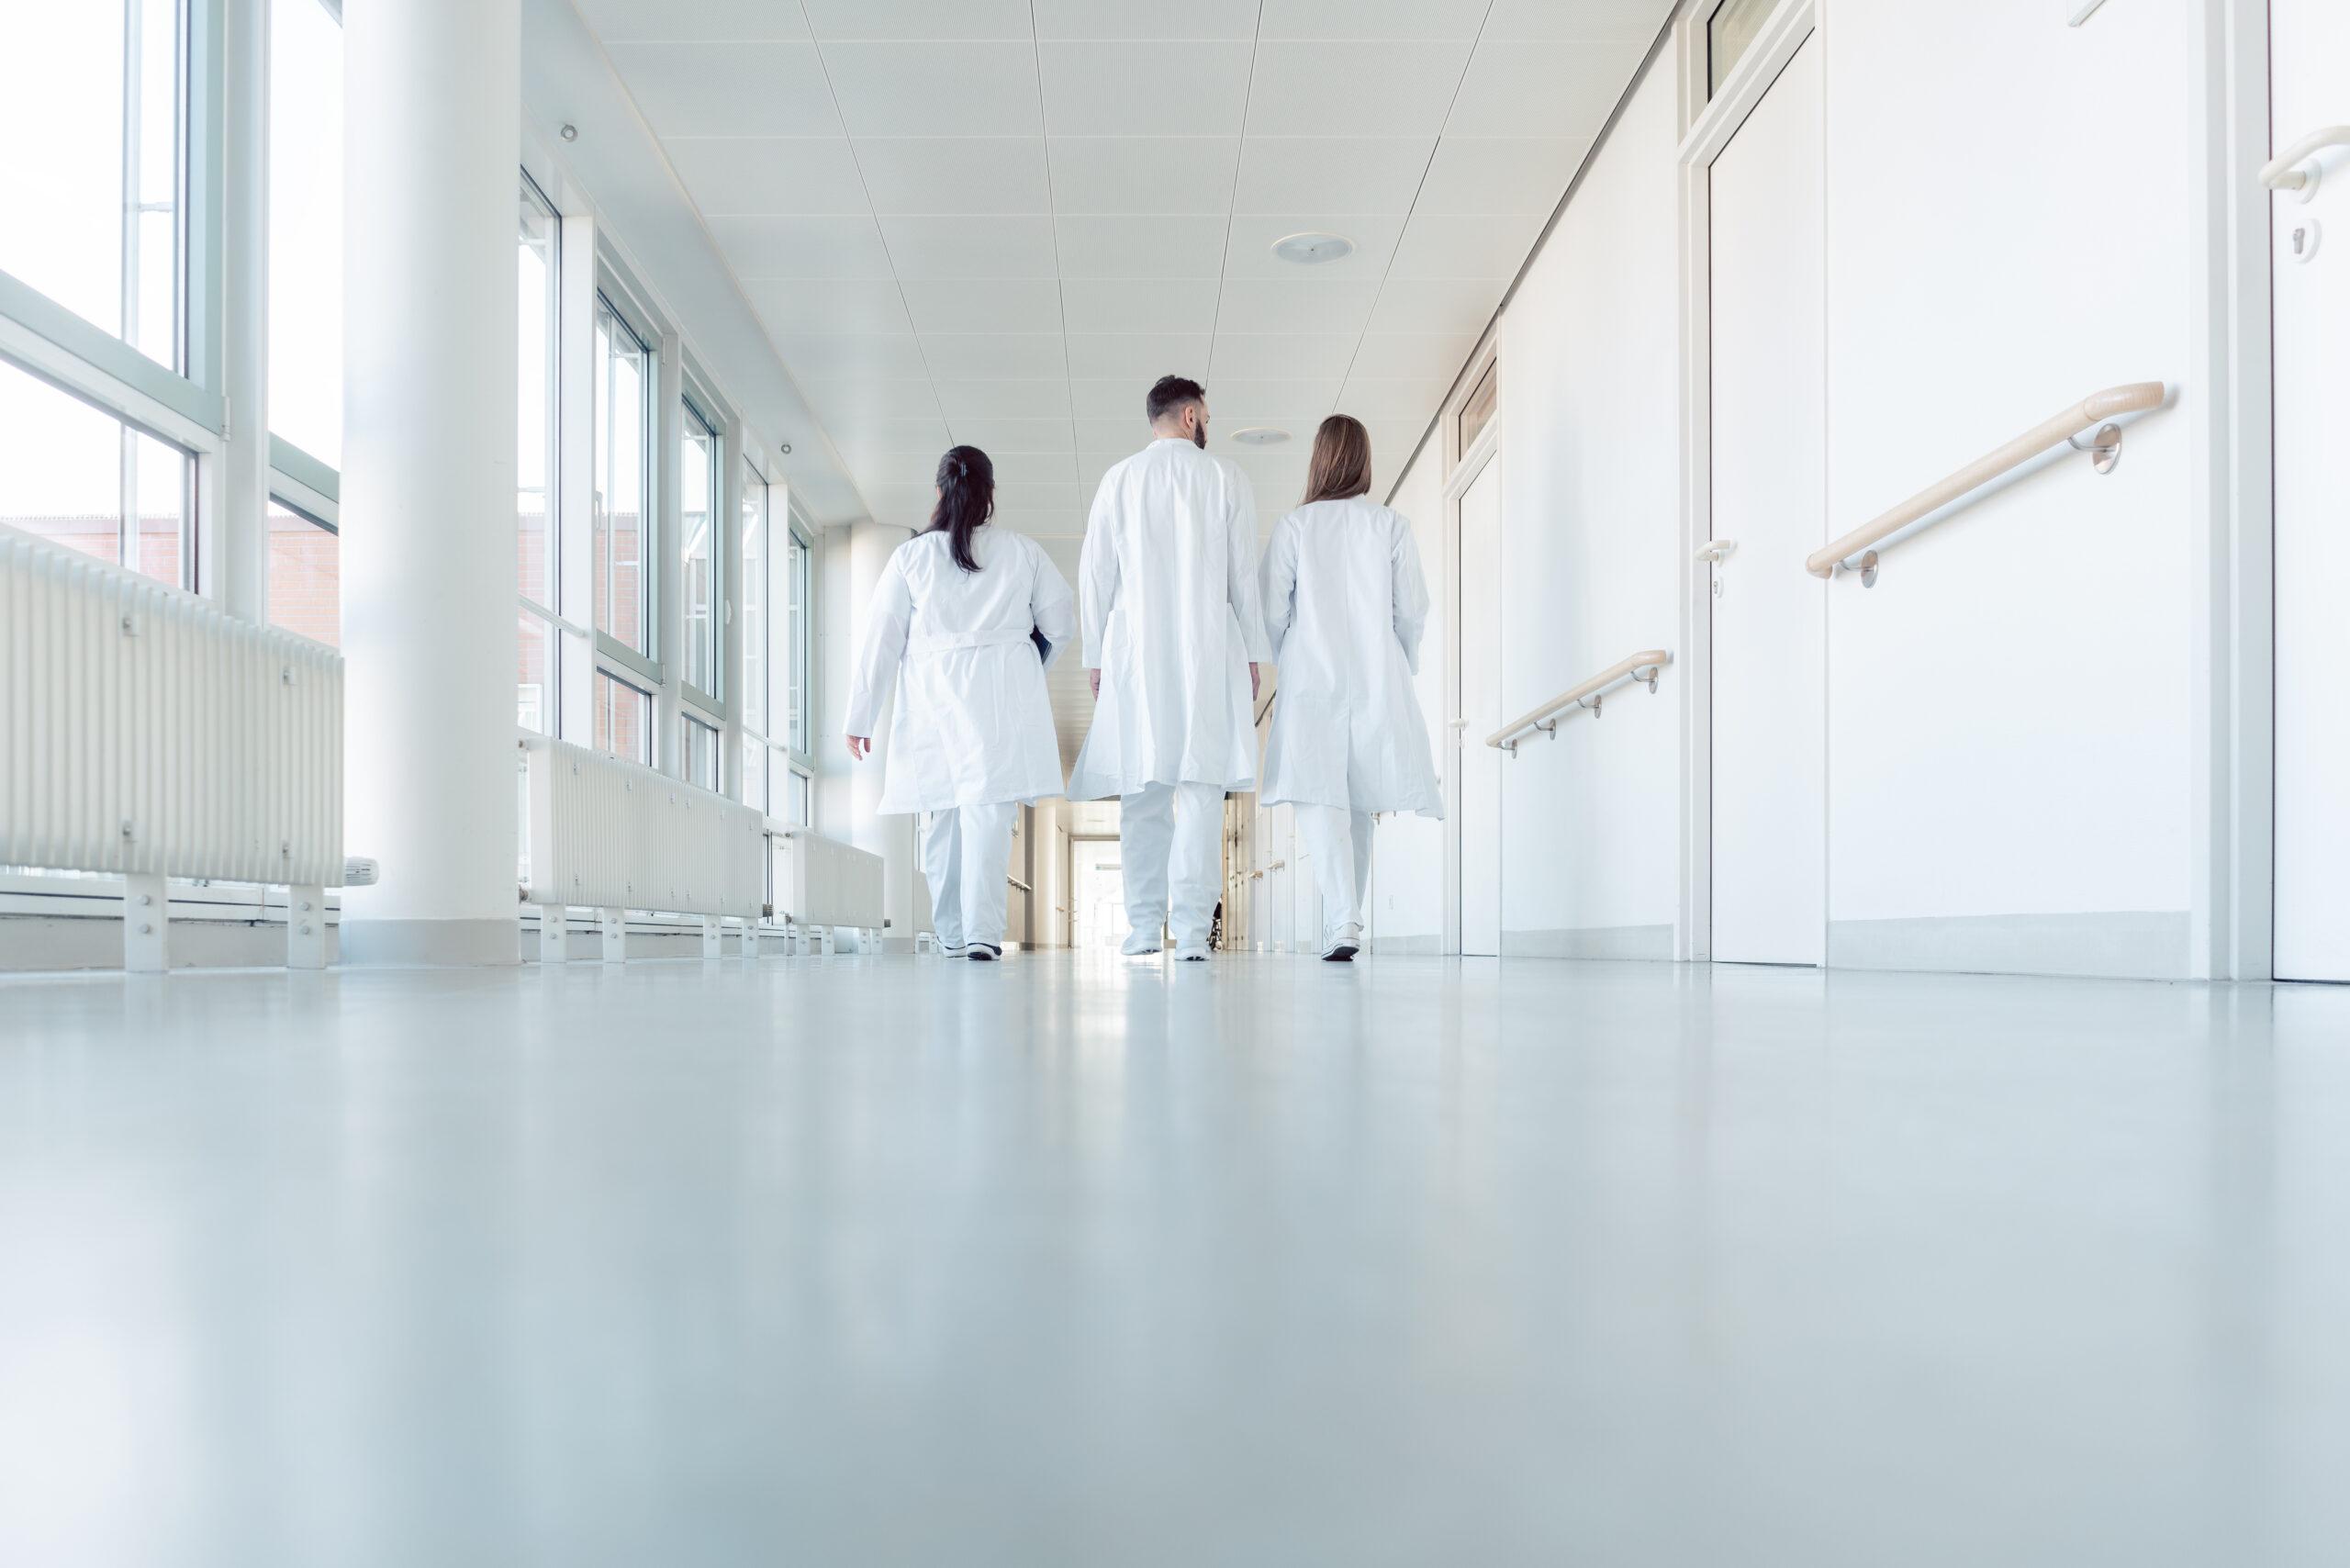 Doctors walk through white corridor together